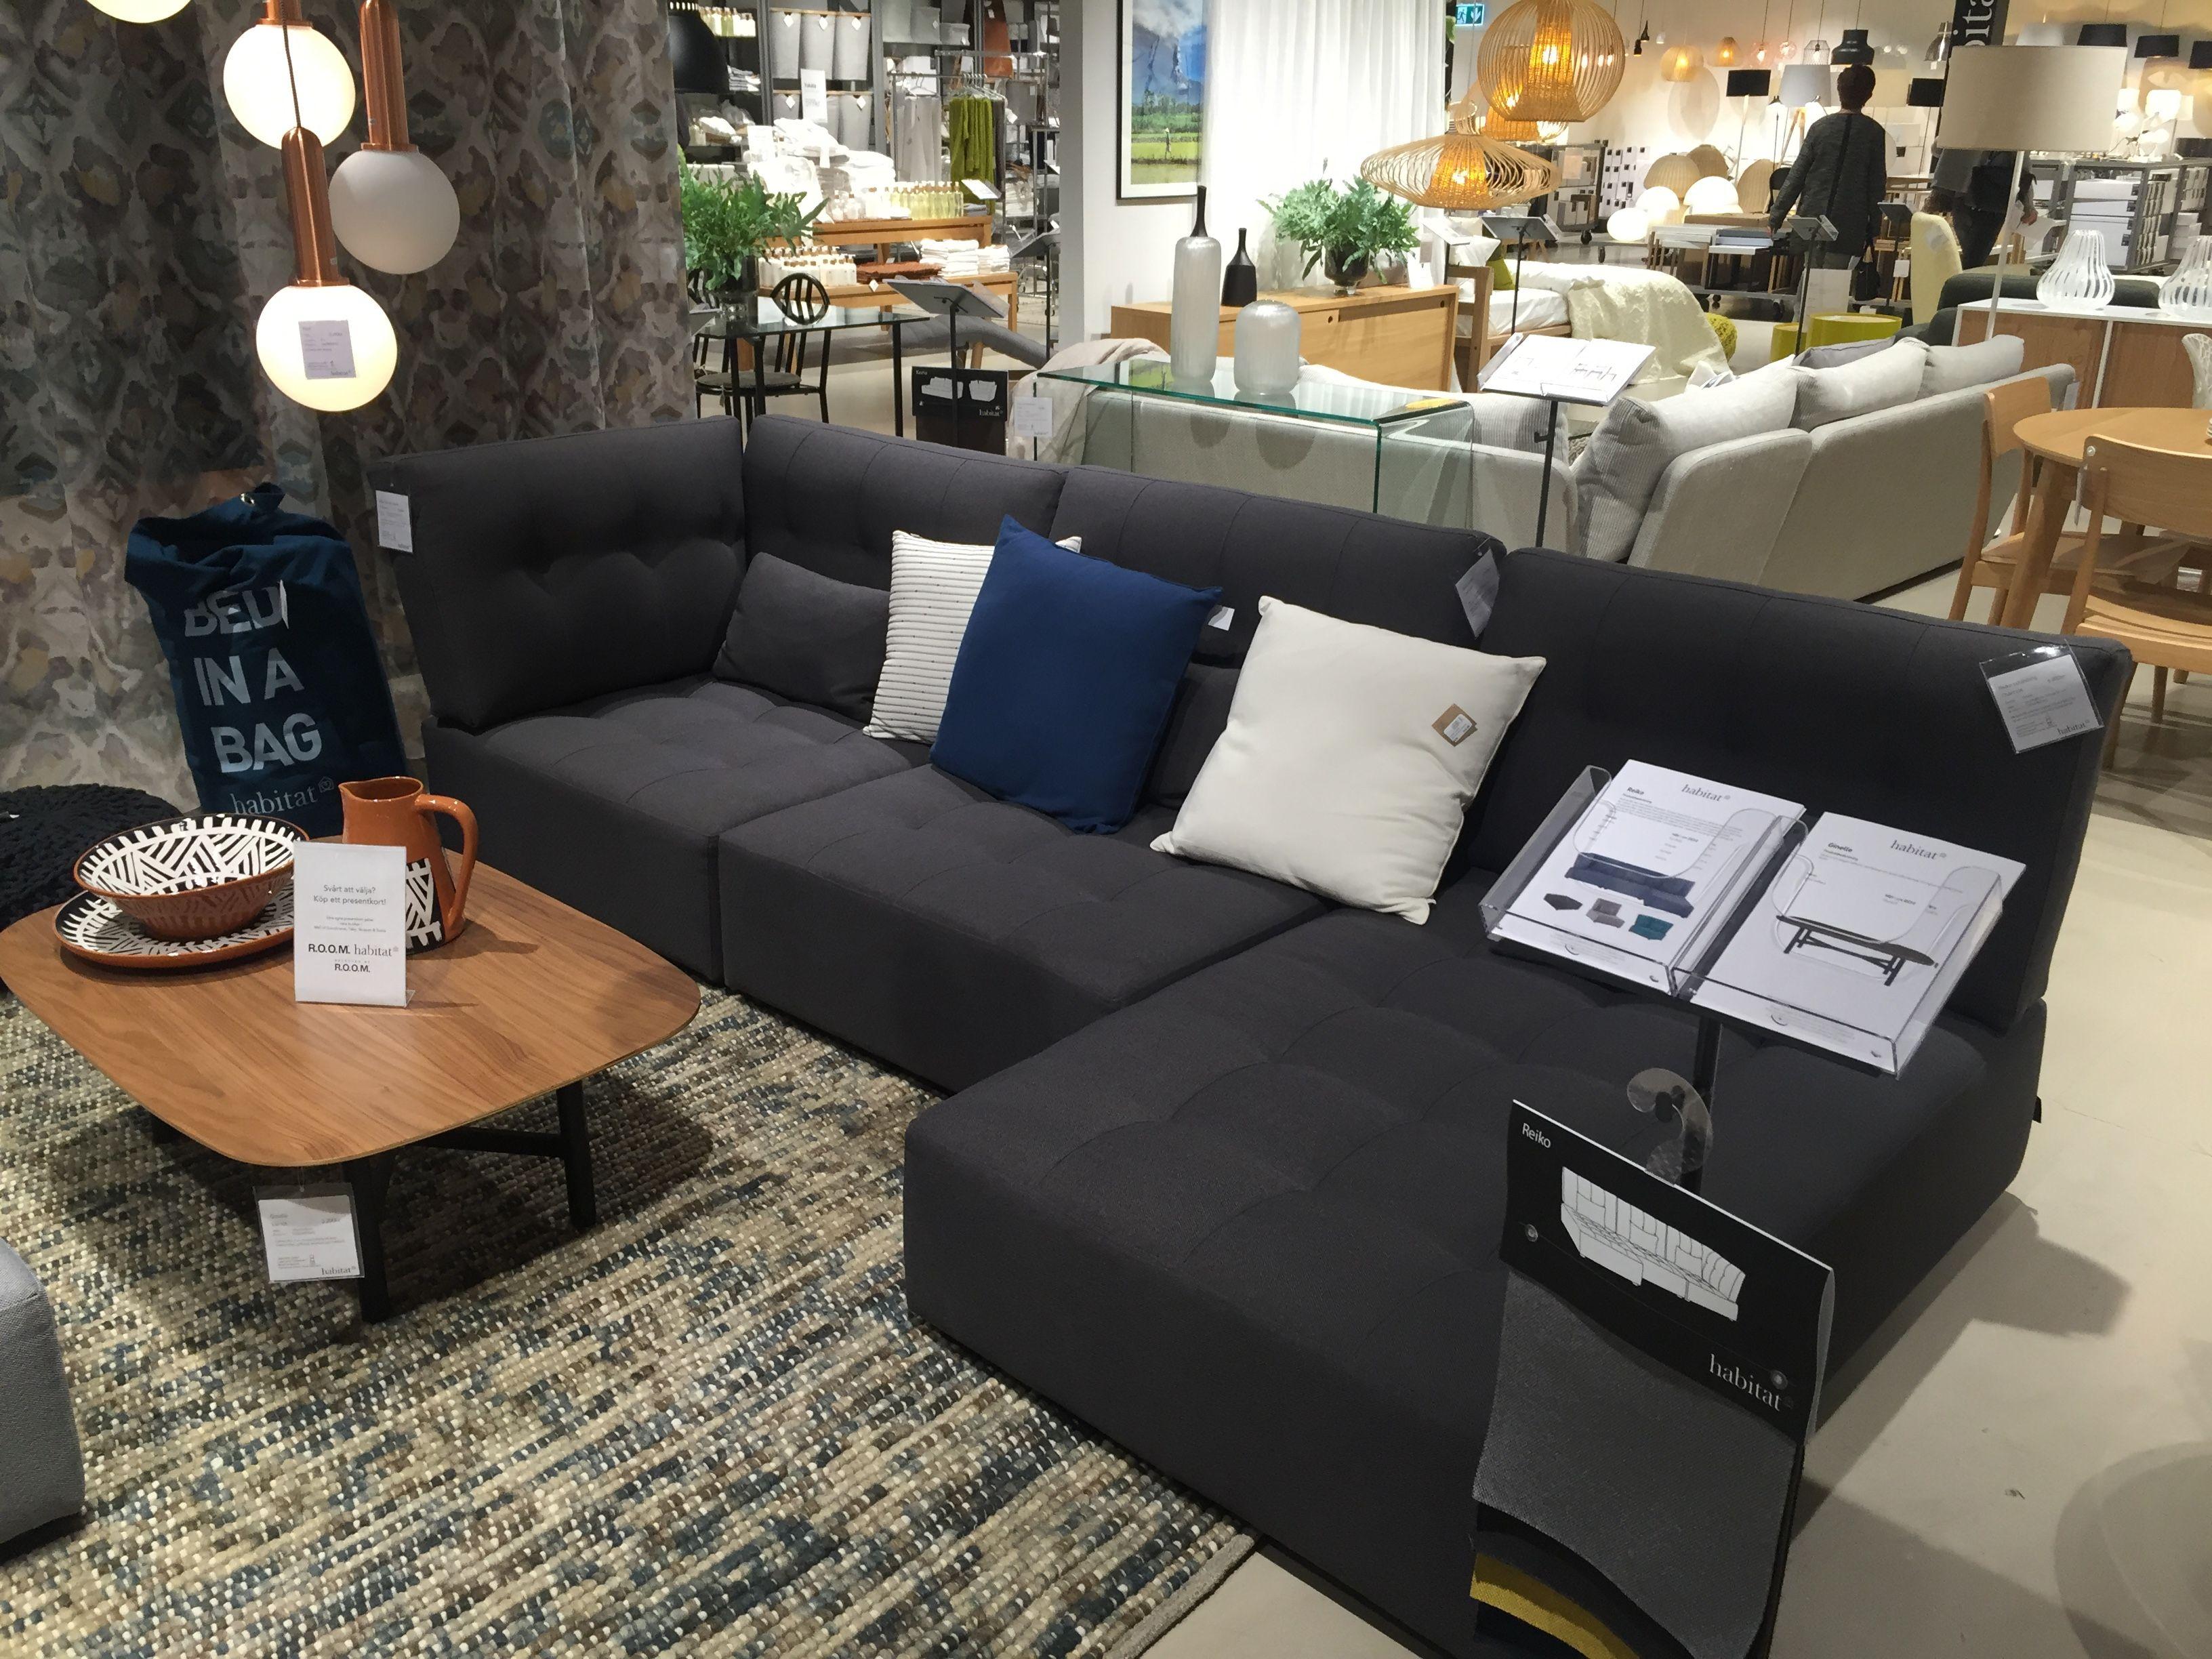 Reiko Modulsoffa Fran Habitat Till Tv Rum Deco Maison Table Basse Maison